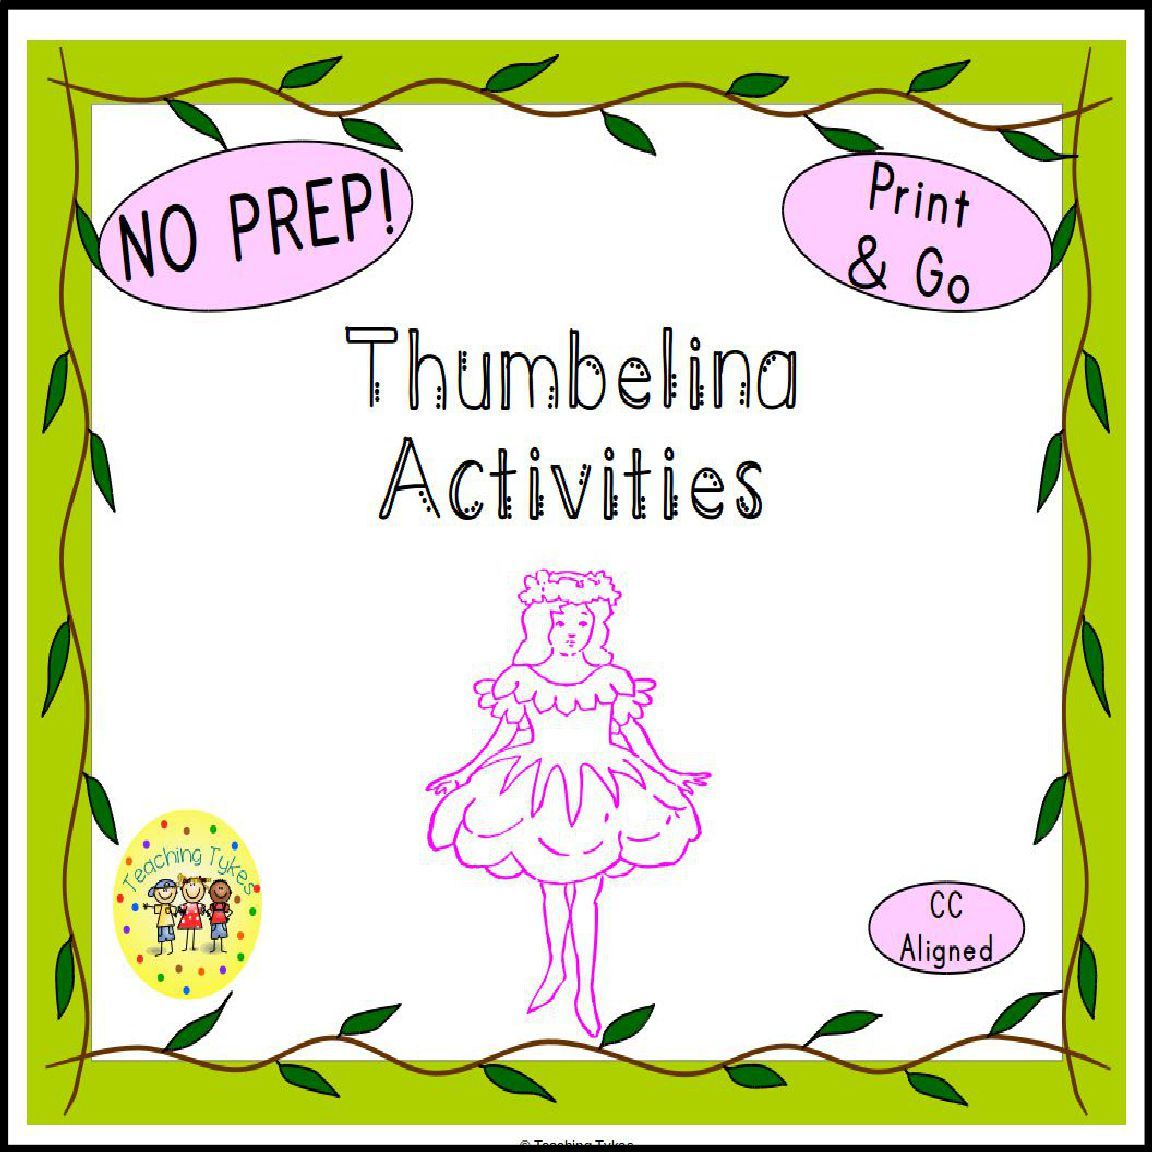 Thumbelina Activities | Fairy Tales Activities and Ideas ...